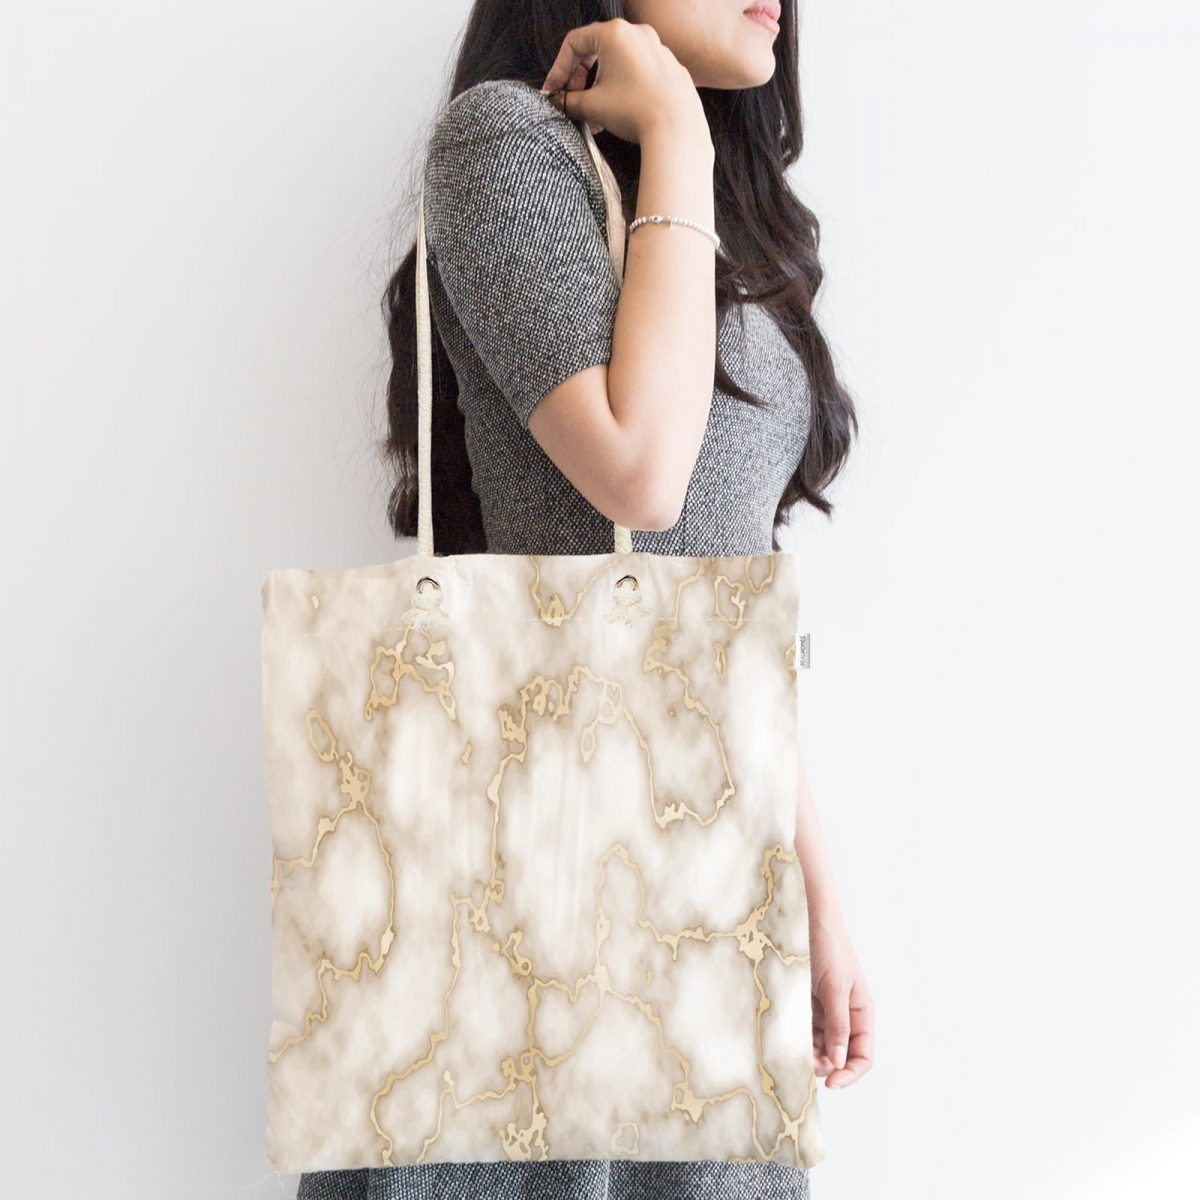 Mermer Zeminli Modern Tasarım Fermuarlı Kumaş Çanta Realhomes